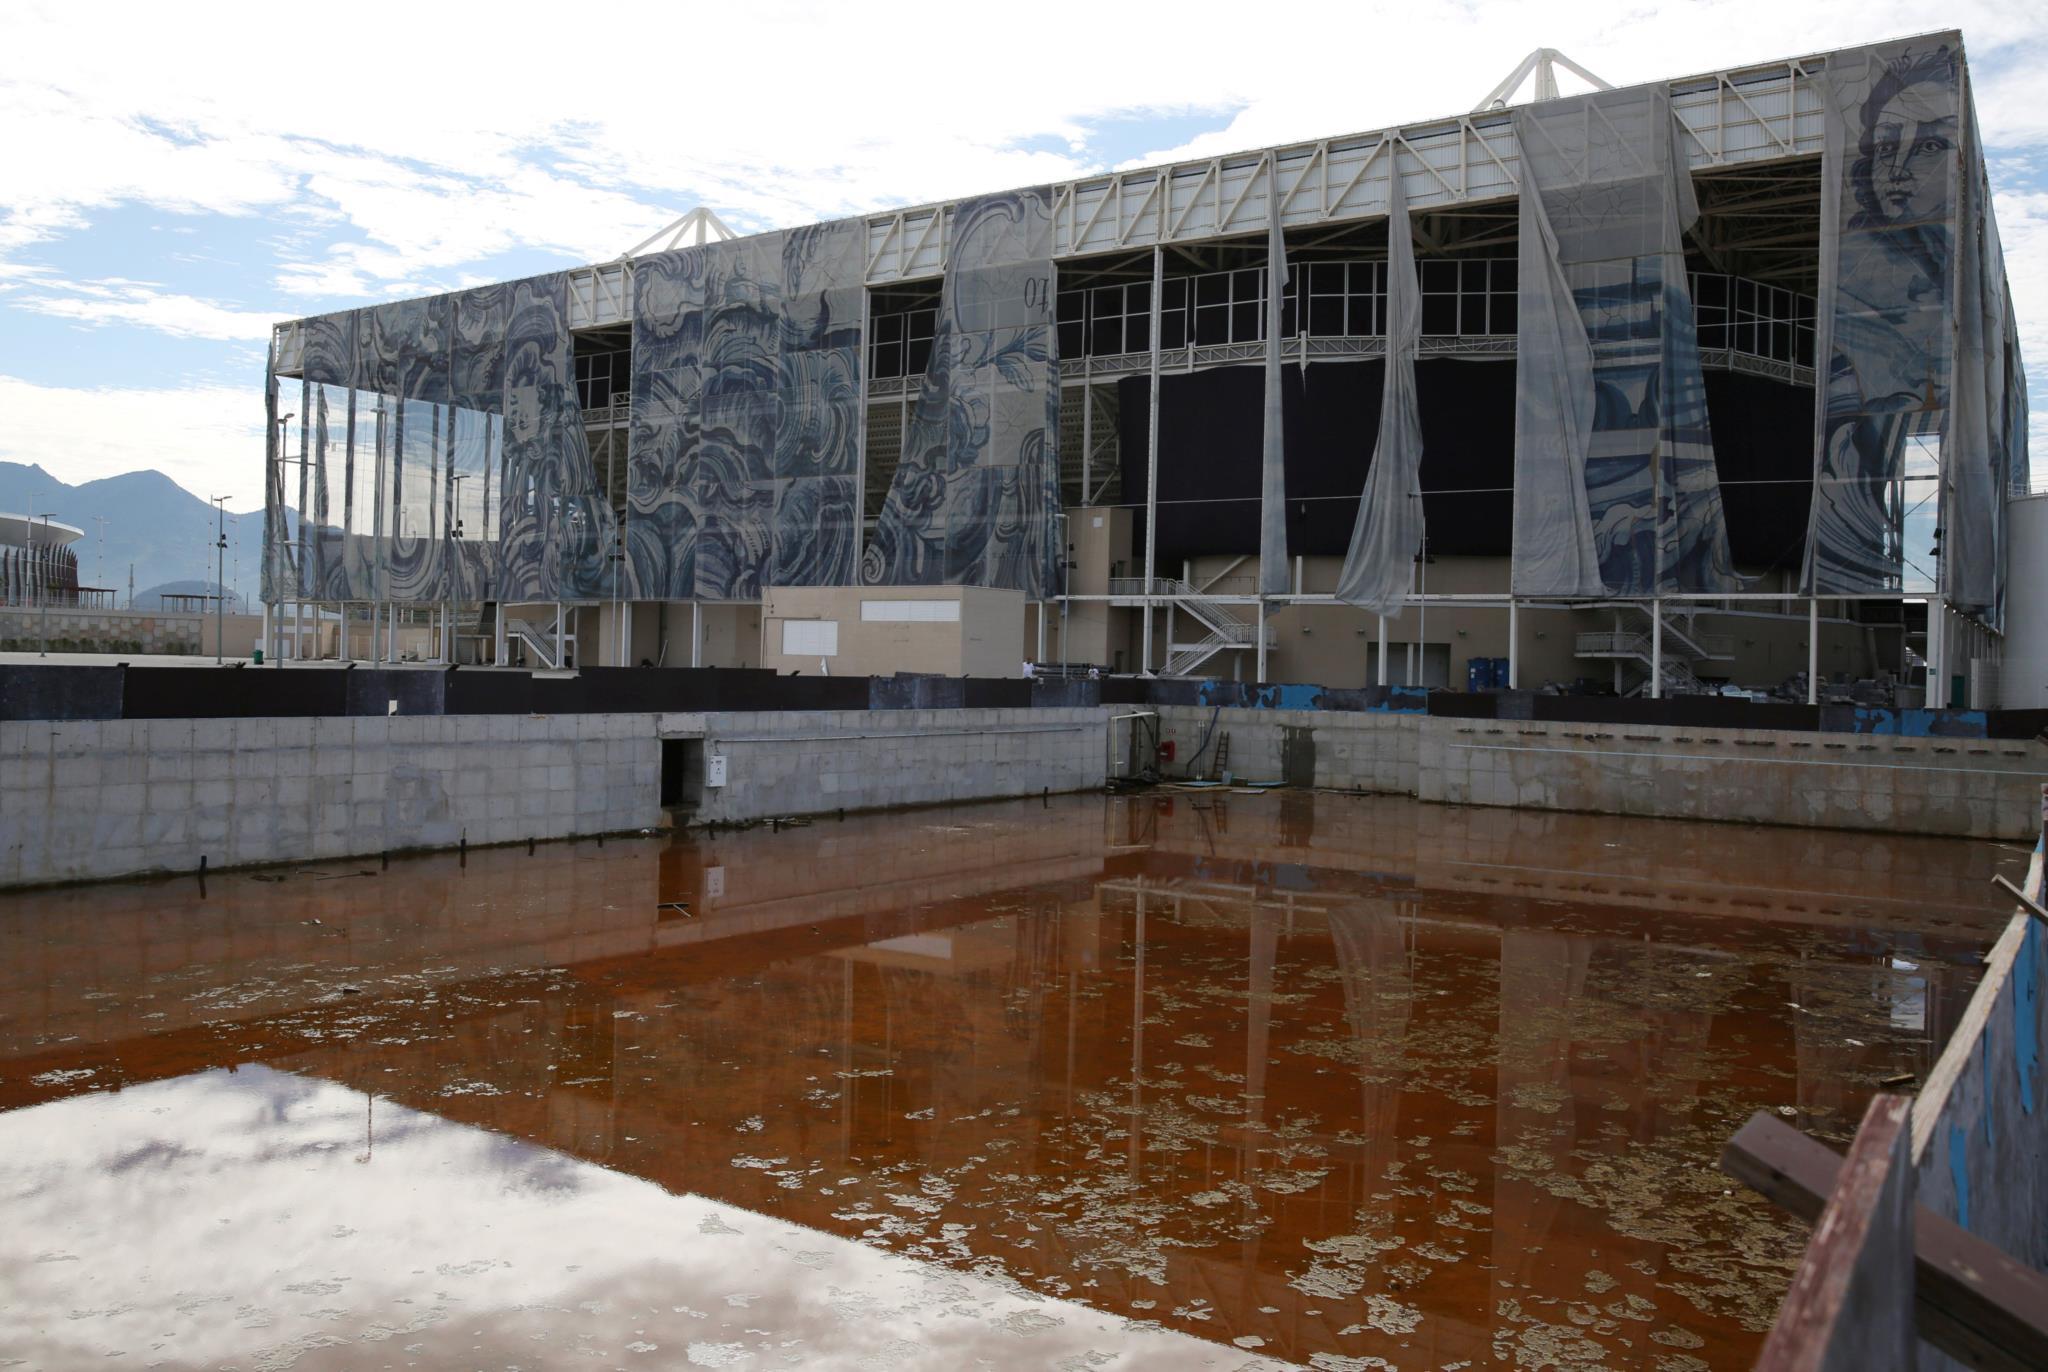 Centro aquático ao abandono